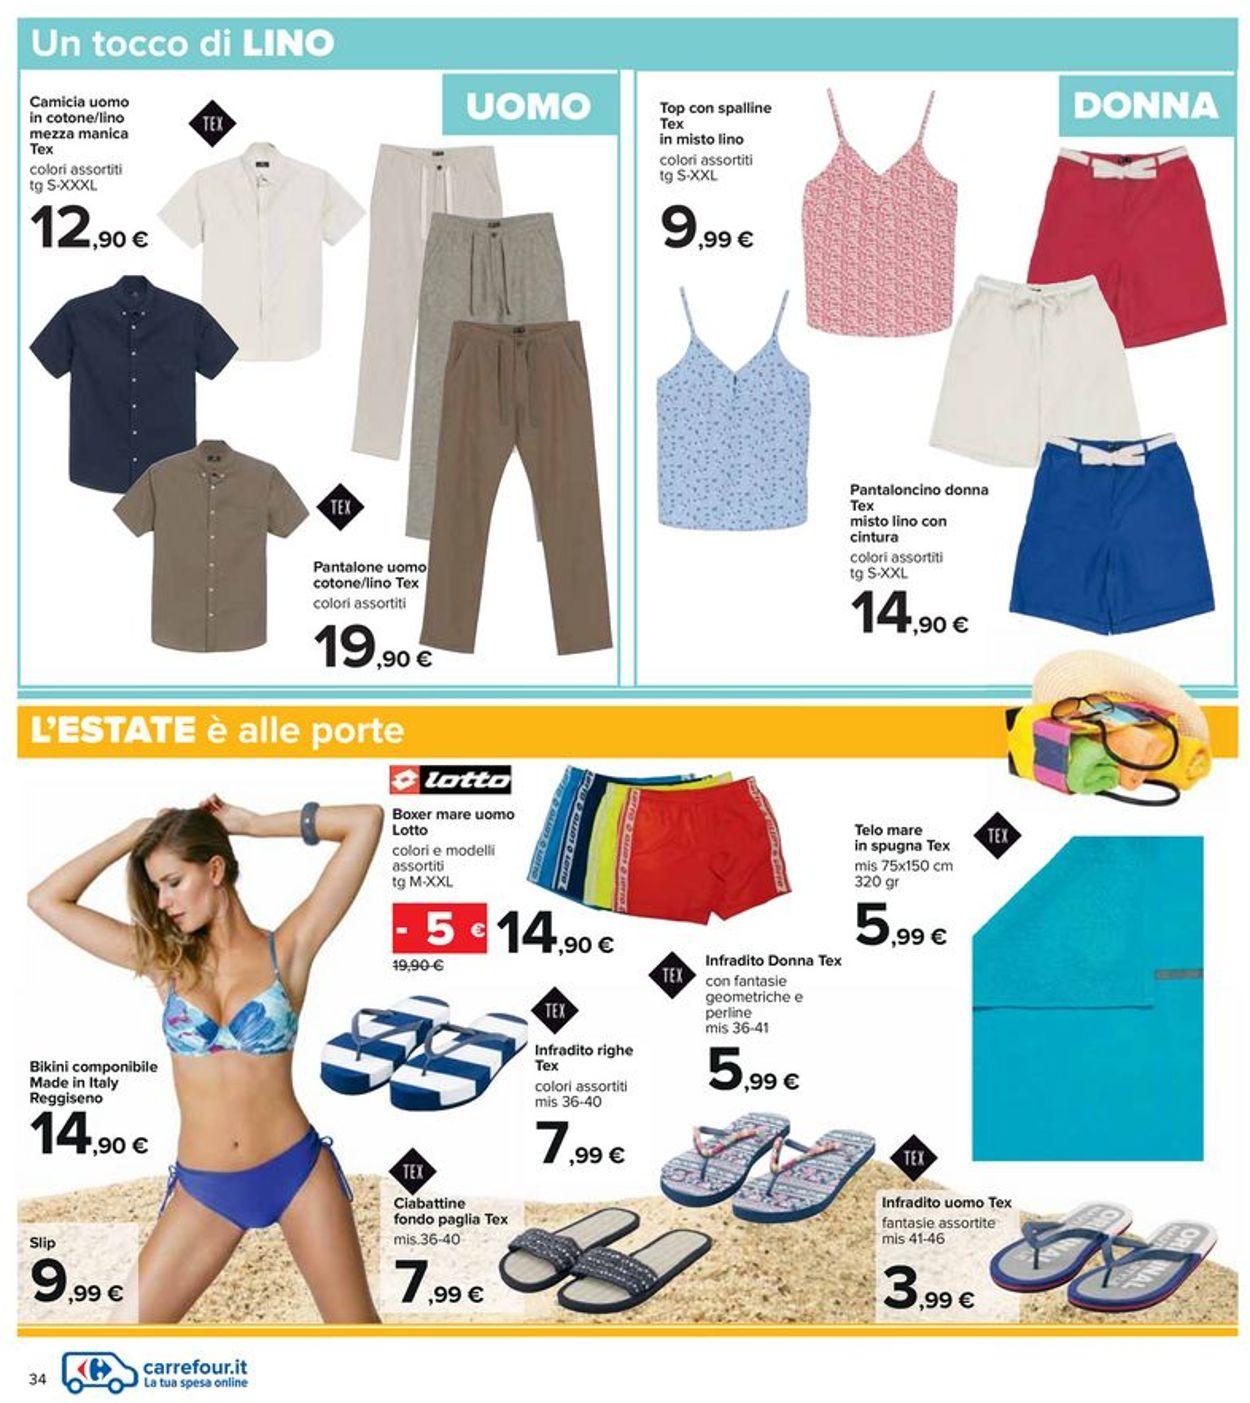 Volantino Carrefour - Offerte 06/05-19/05/2021 (Pagina 34)